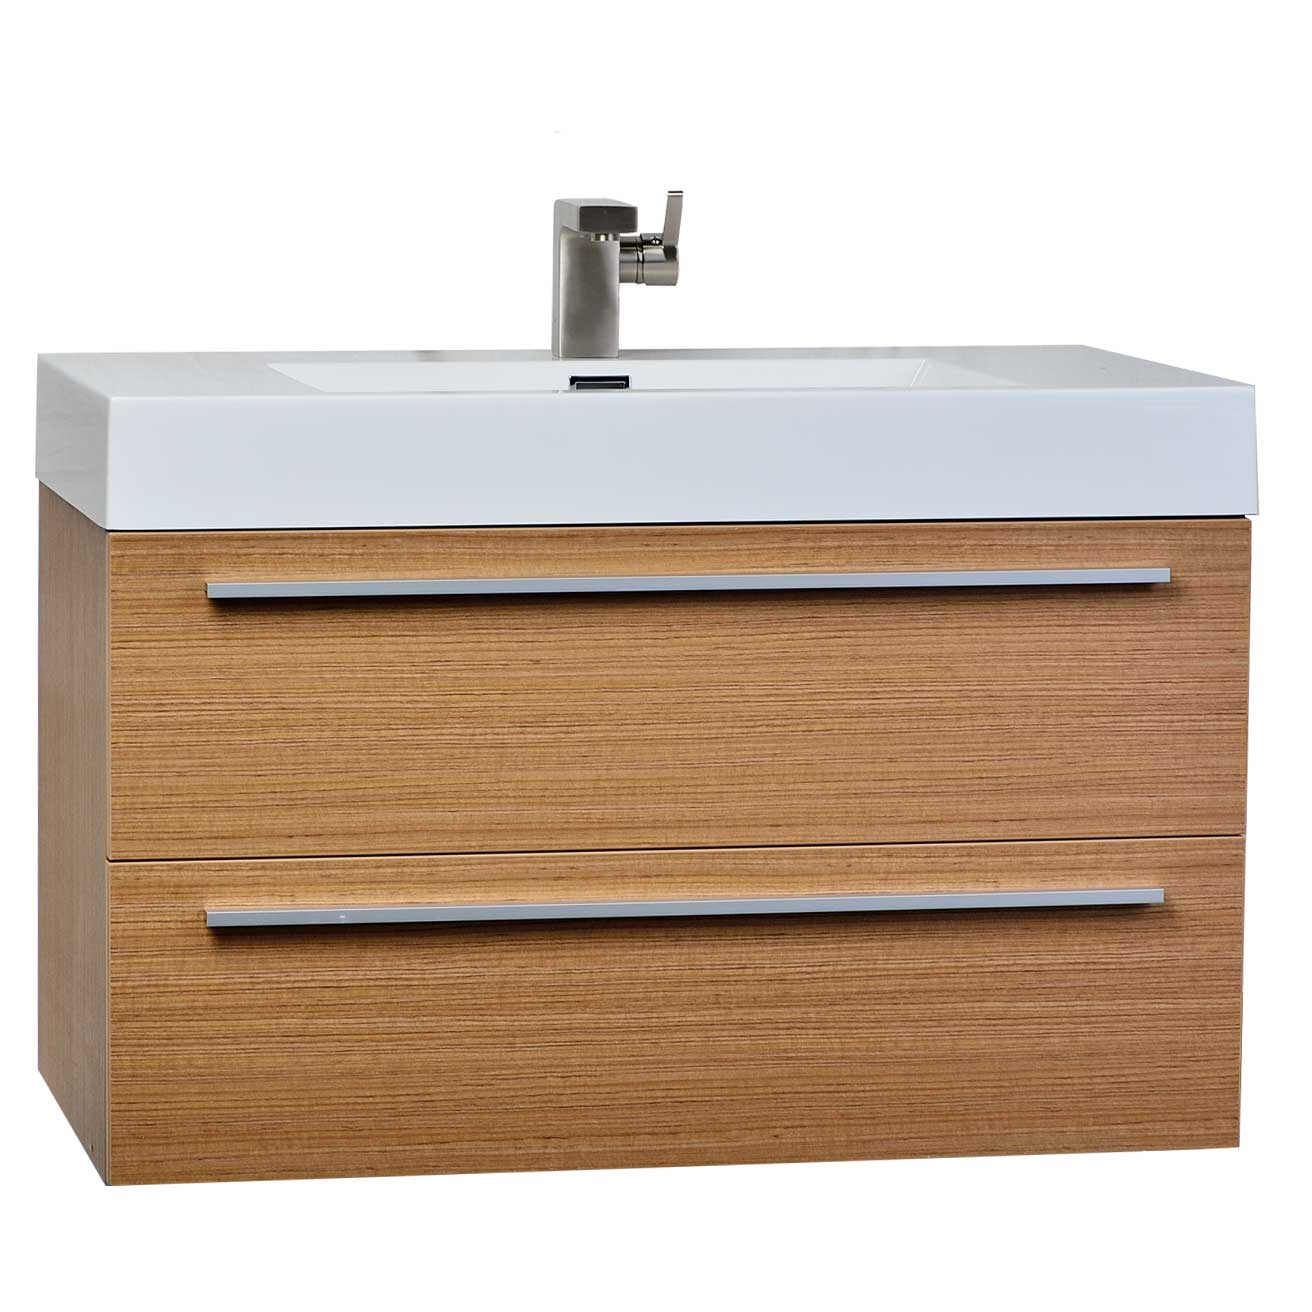 Buy 35.5 In. Wall-Mount Contemporary Bathroom Vanity Light Teak TN-M900-PT on Conceptbaths.com ...